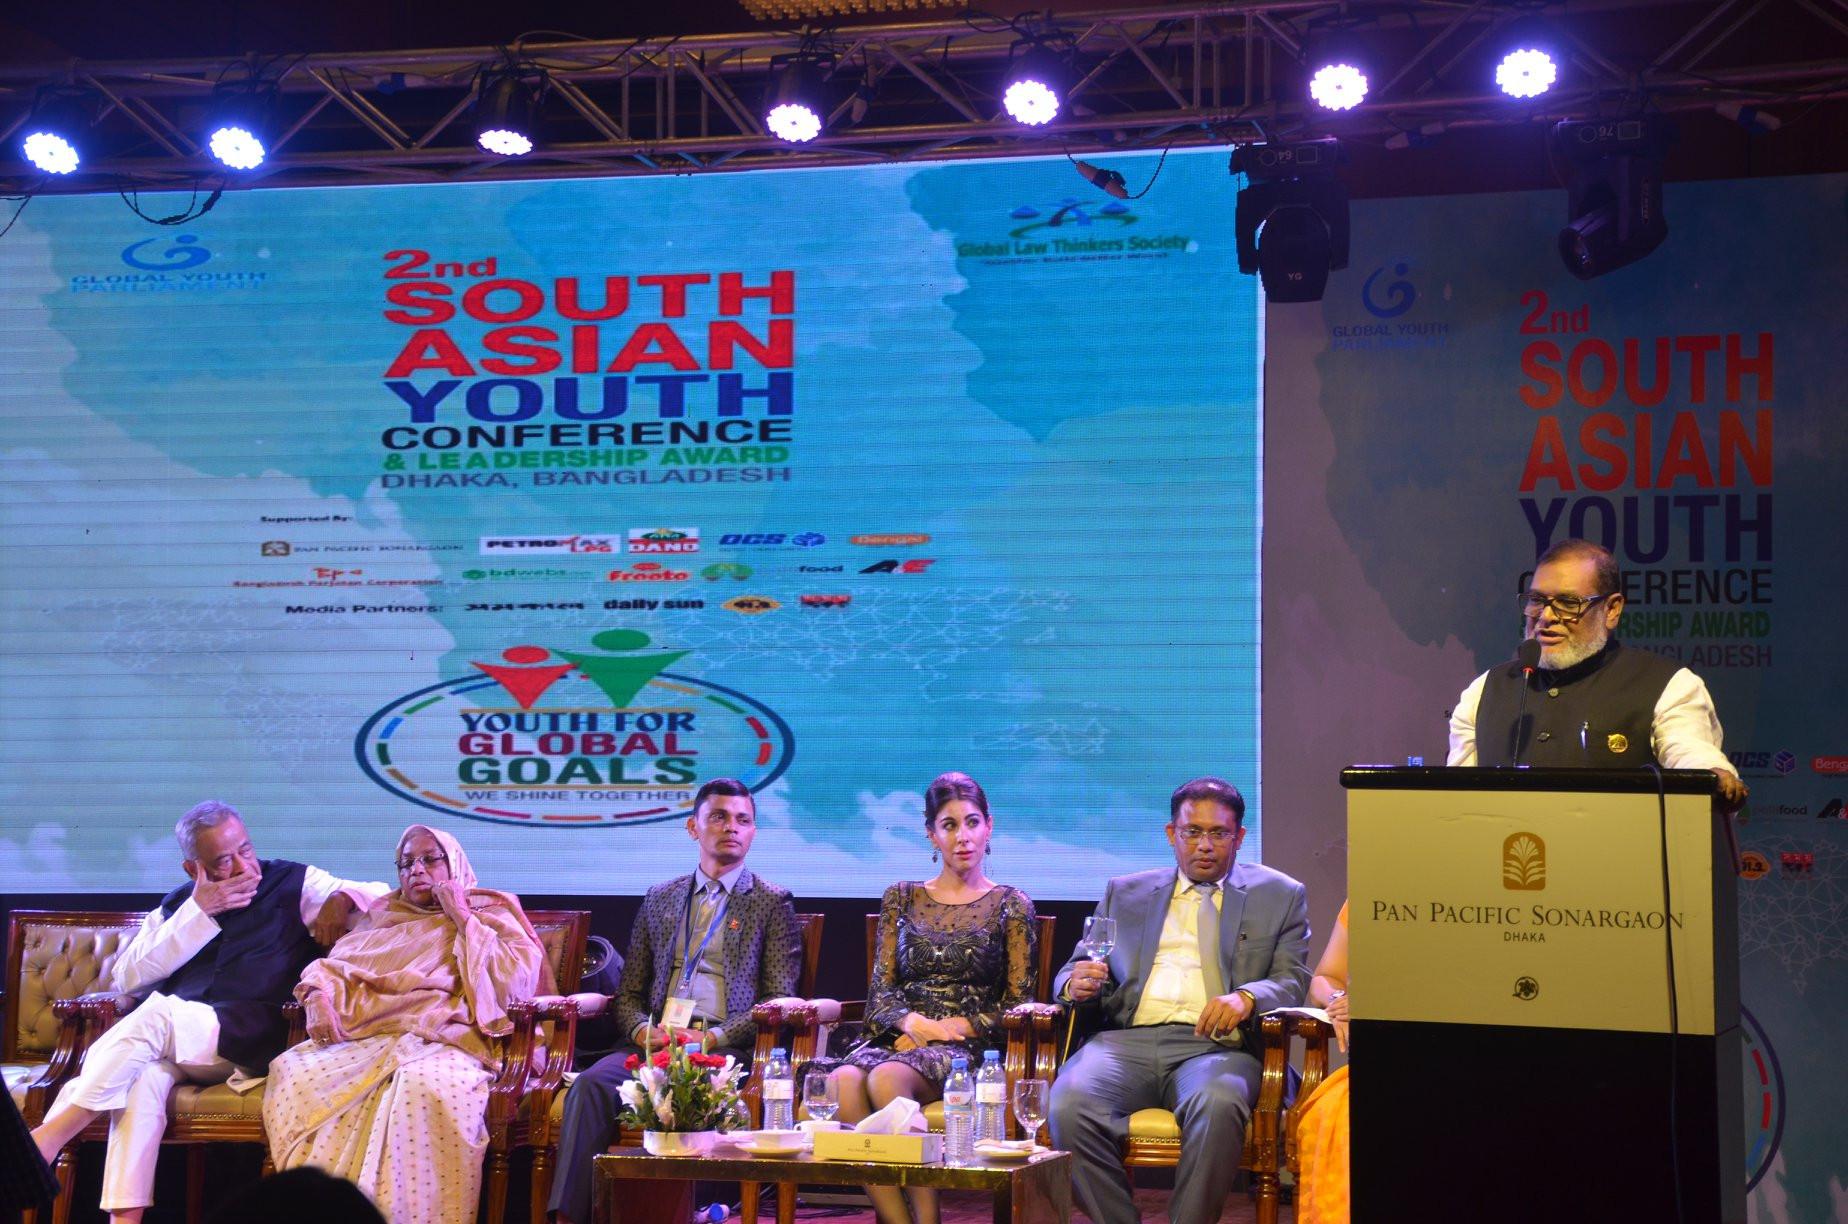 नेपाली युवा र राजदूतबीच बंगलादेशमा भेटवार्ता